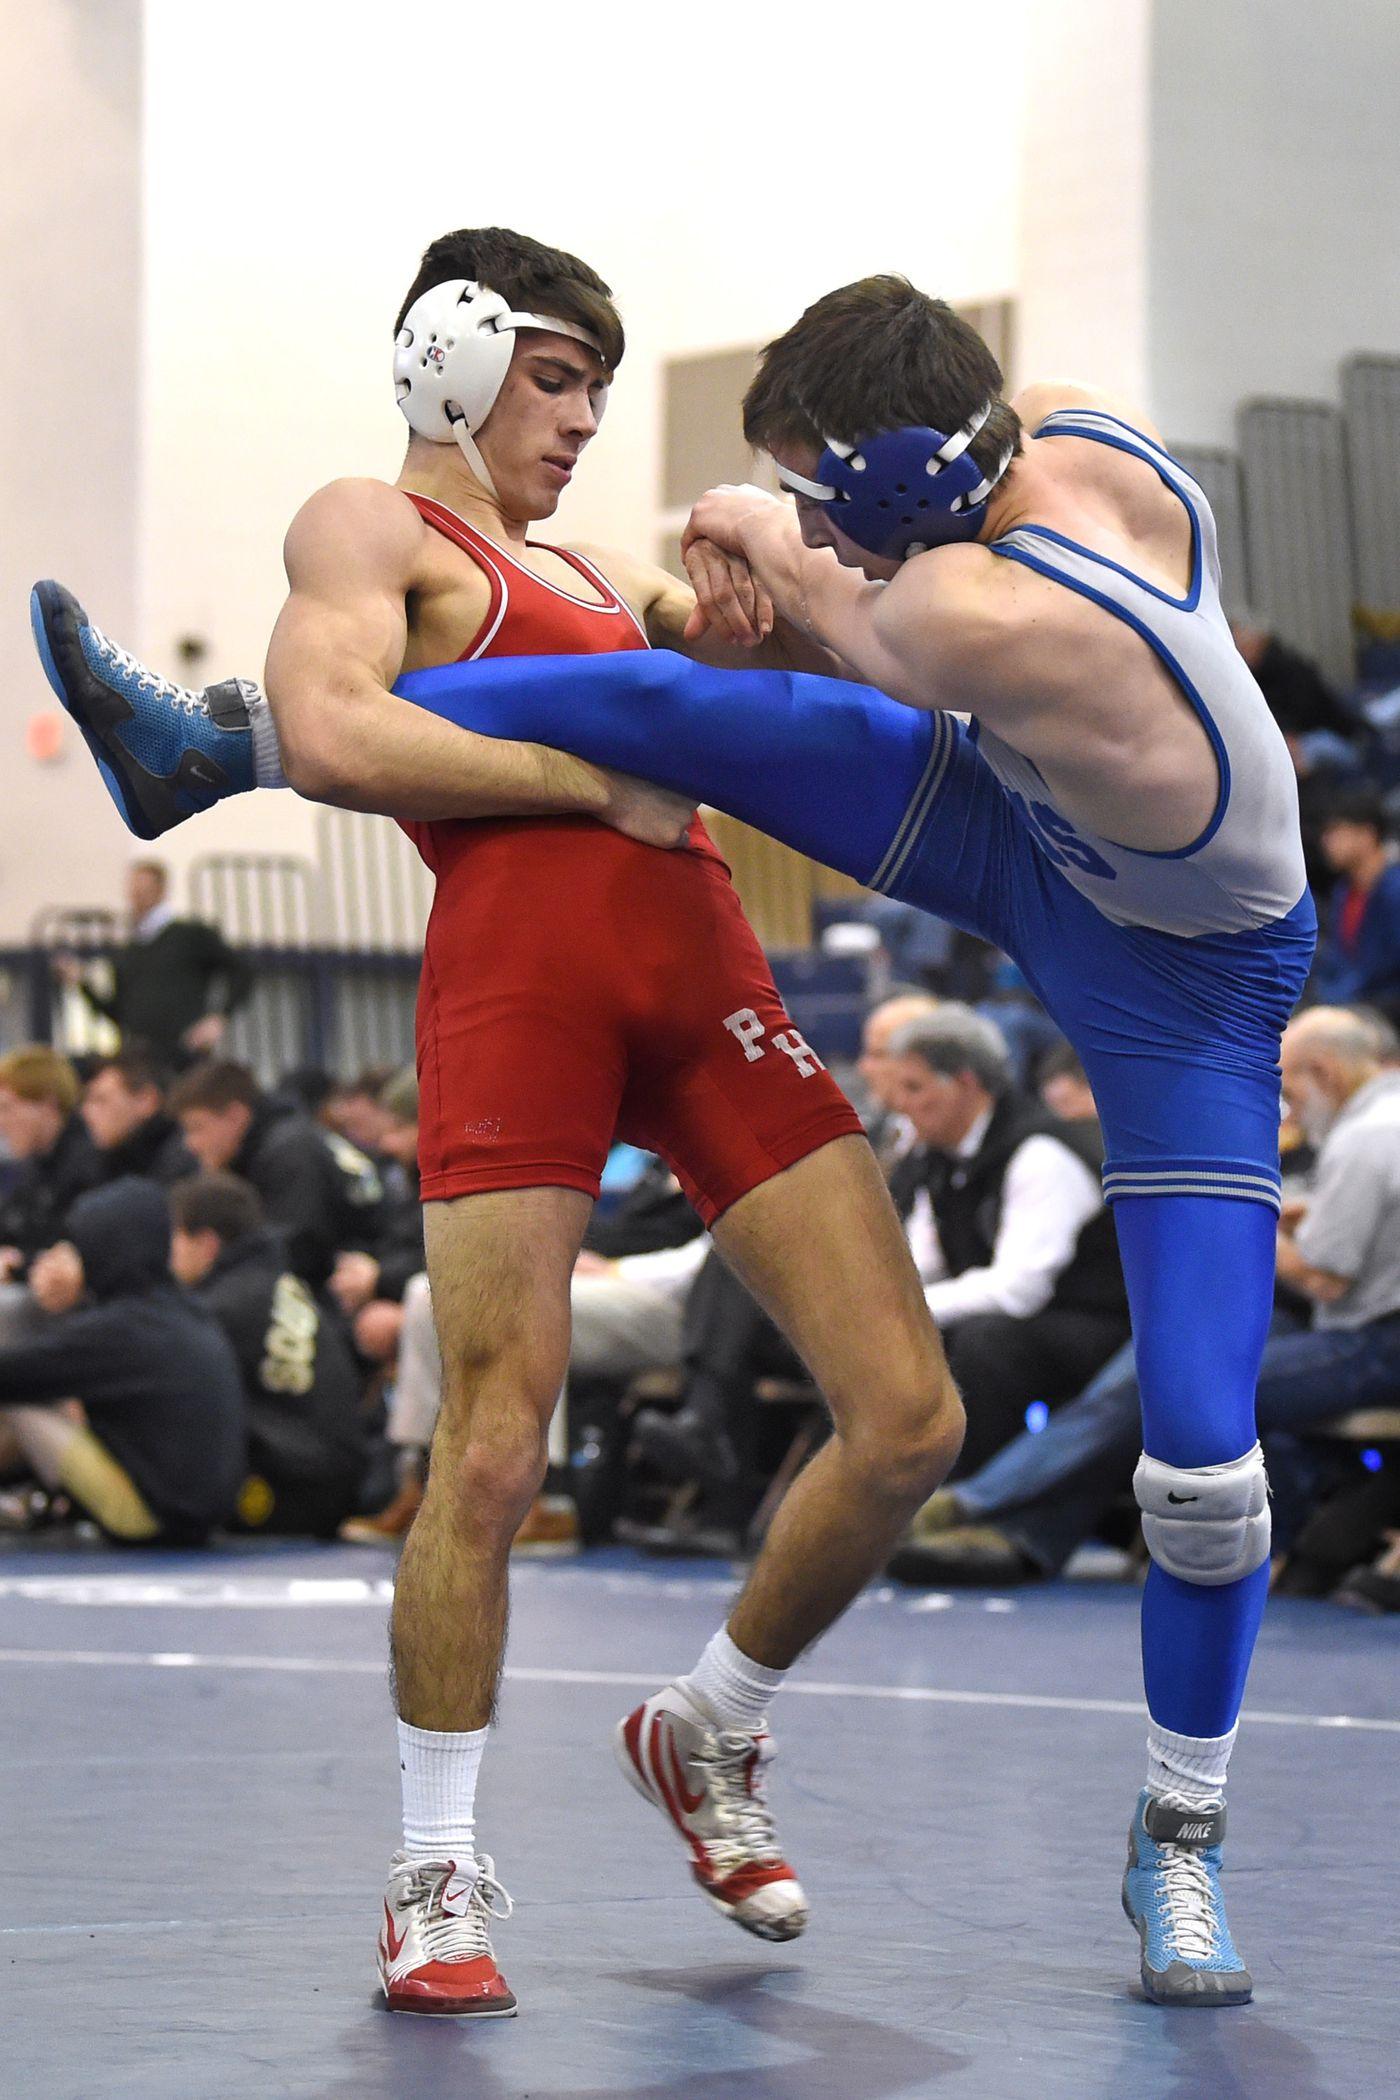 Paulsboro's Paul Morina wins 700th match in state wrestling final